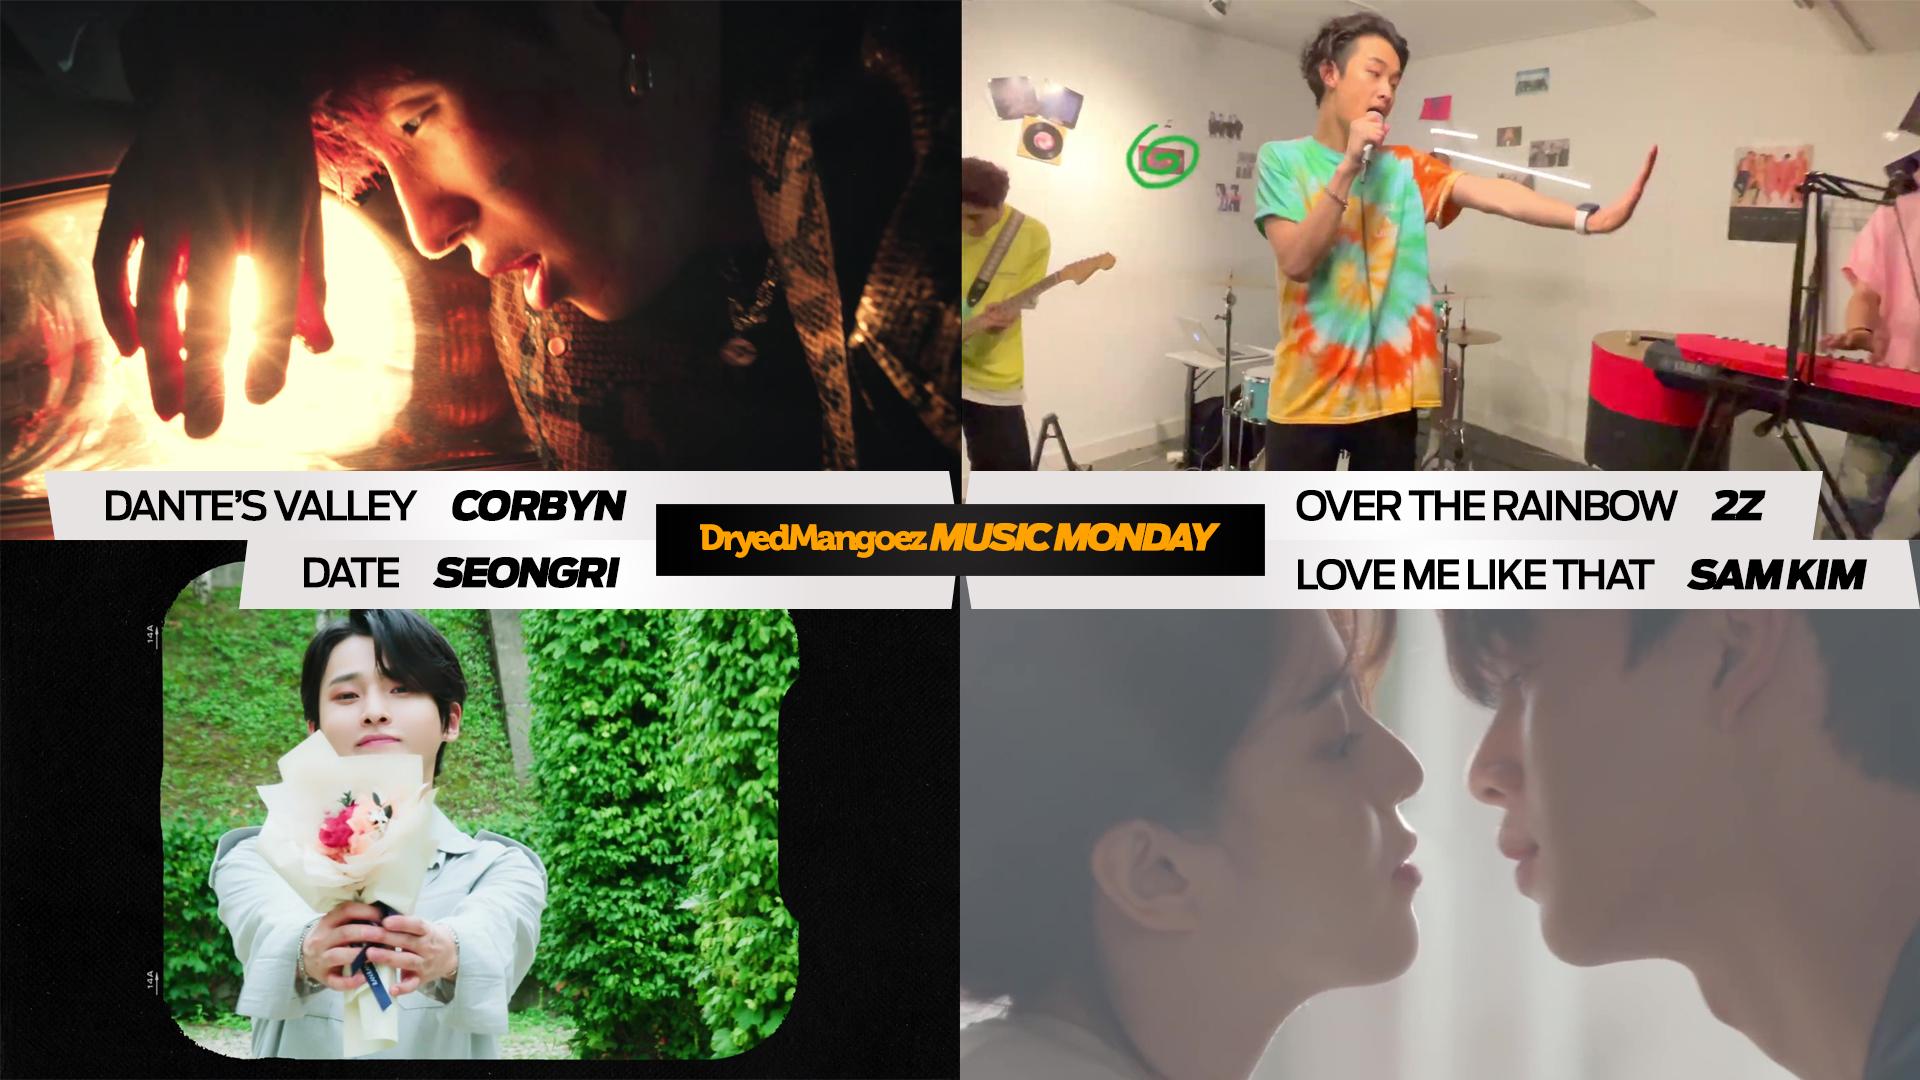 Music Monday, July 26, 2021 – Excellent tracks from CORBYN, 2Z, Seongri, Sam Kim